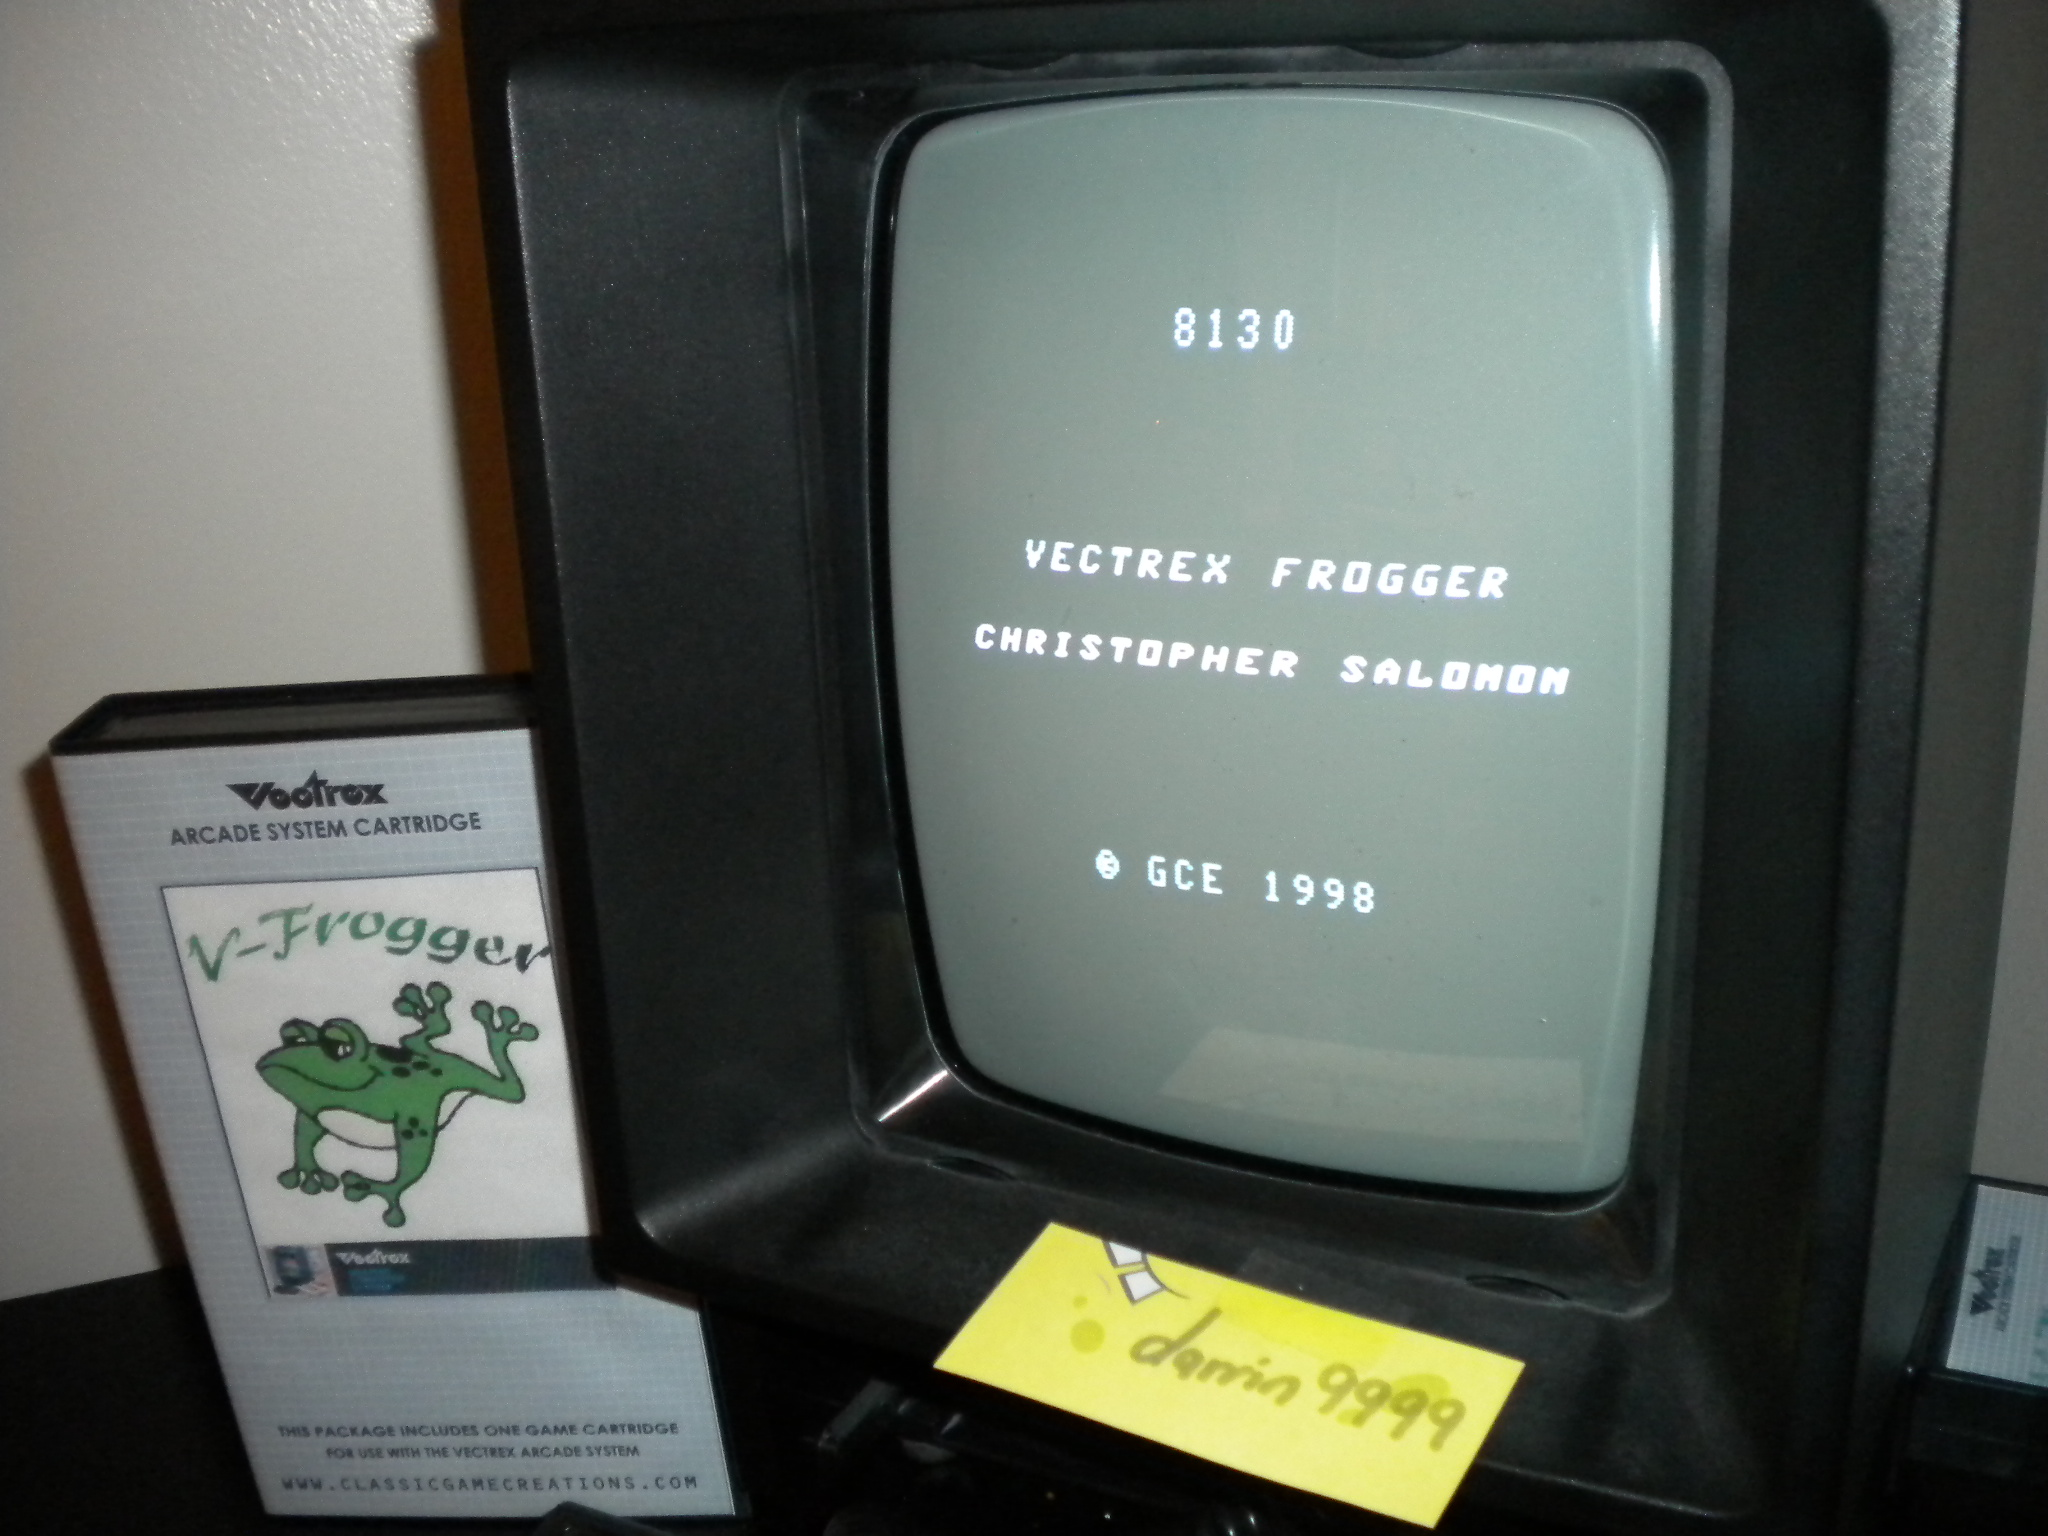 V-Frogger 8,130 points